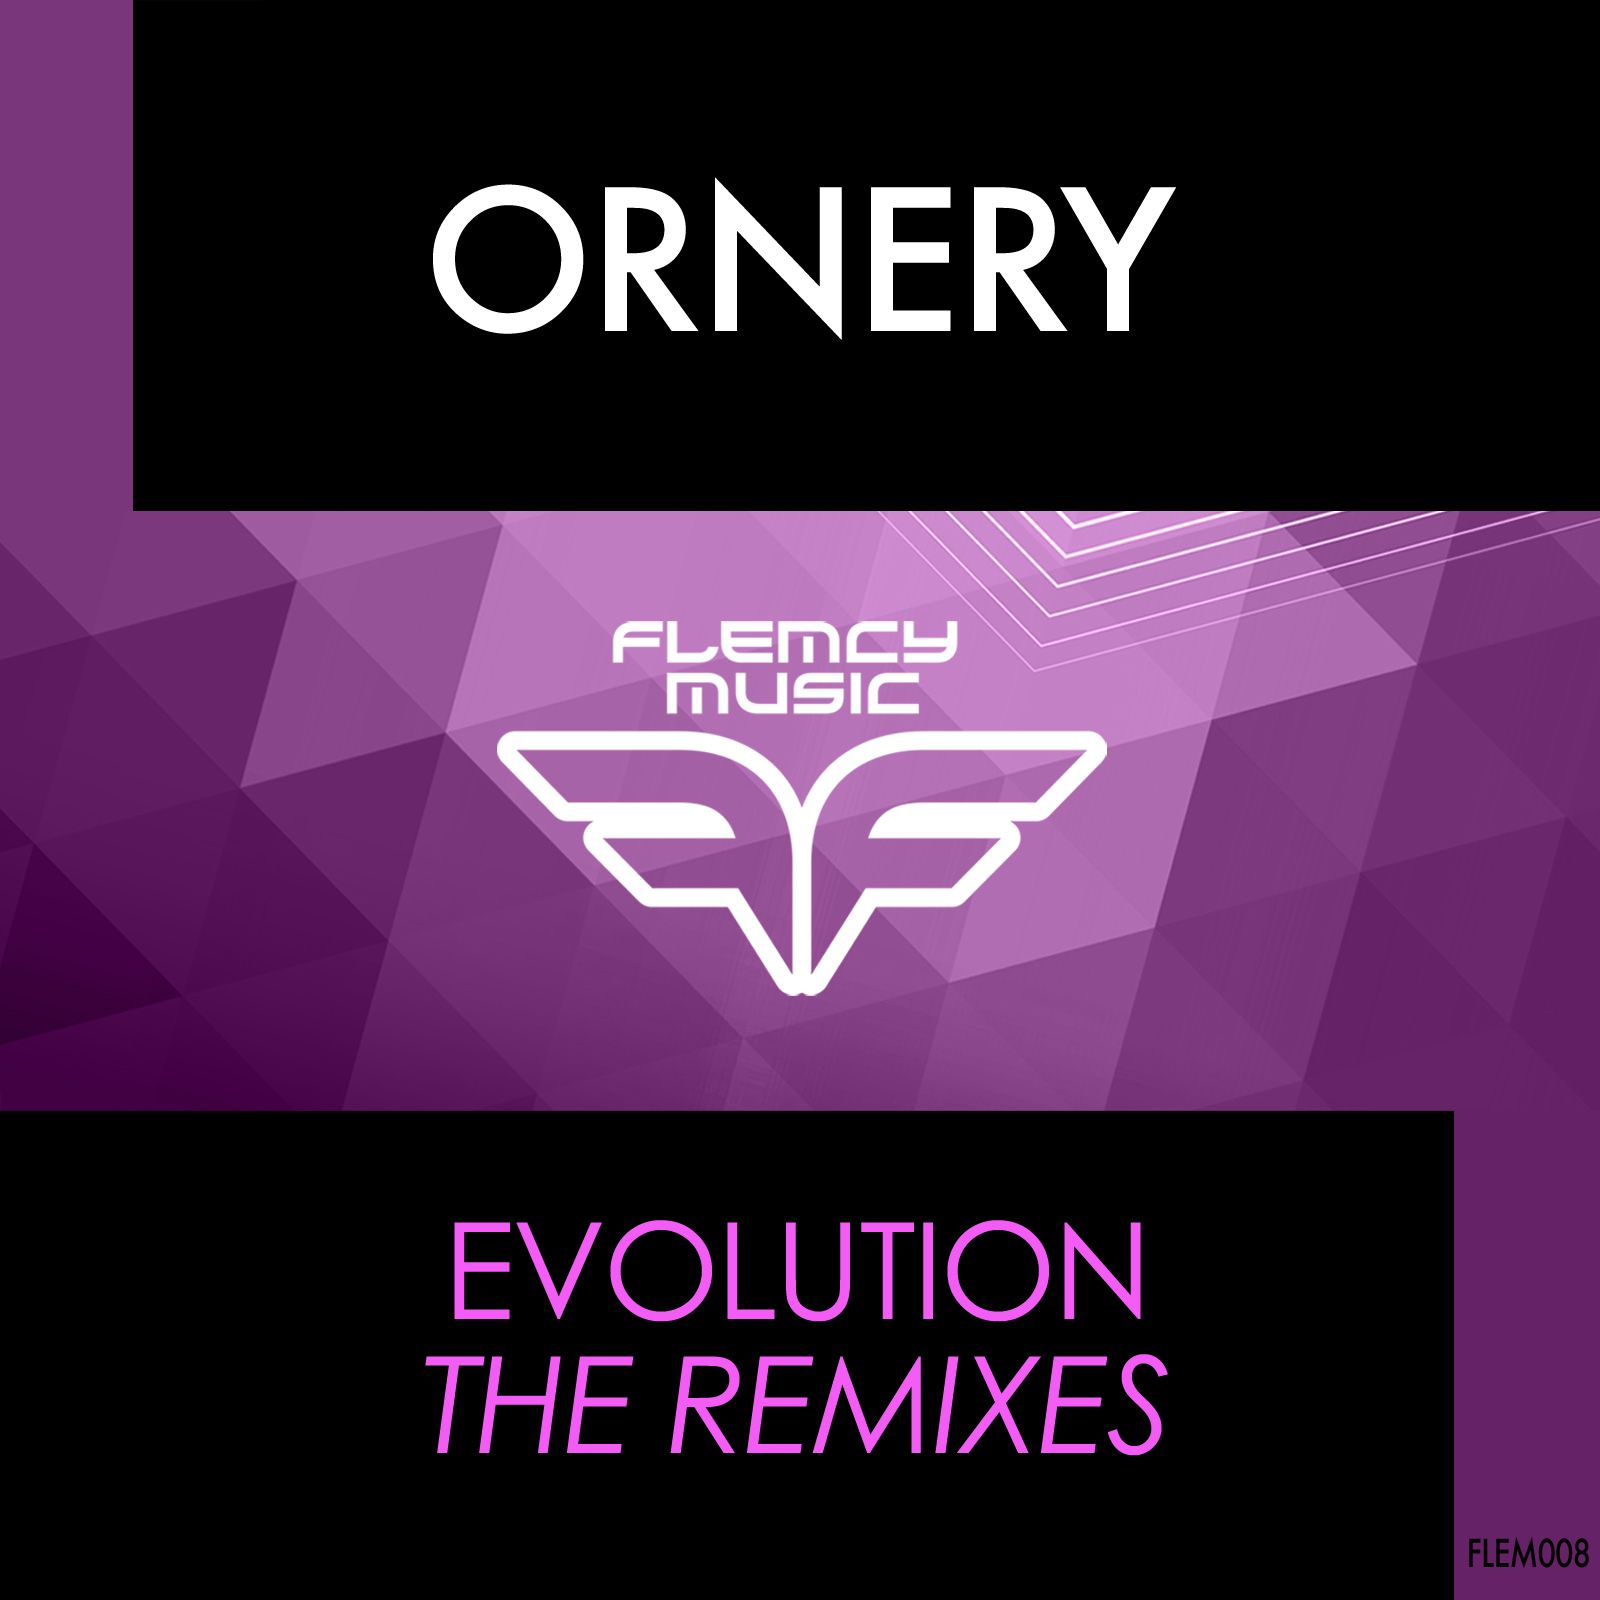 ornery_-_evolution_remixes.jpg